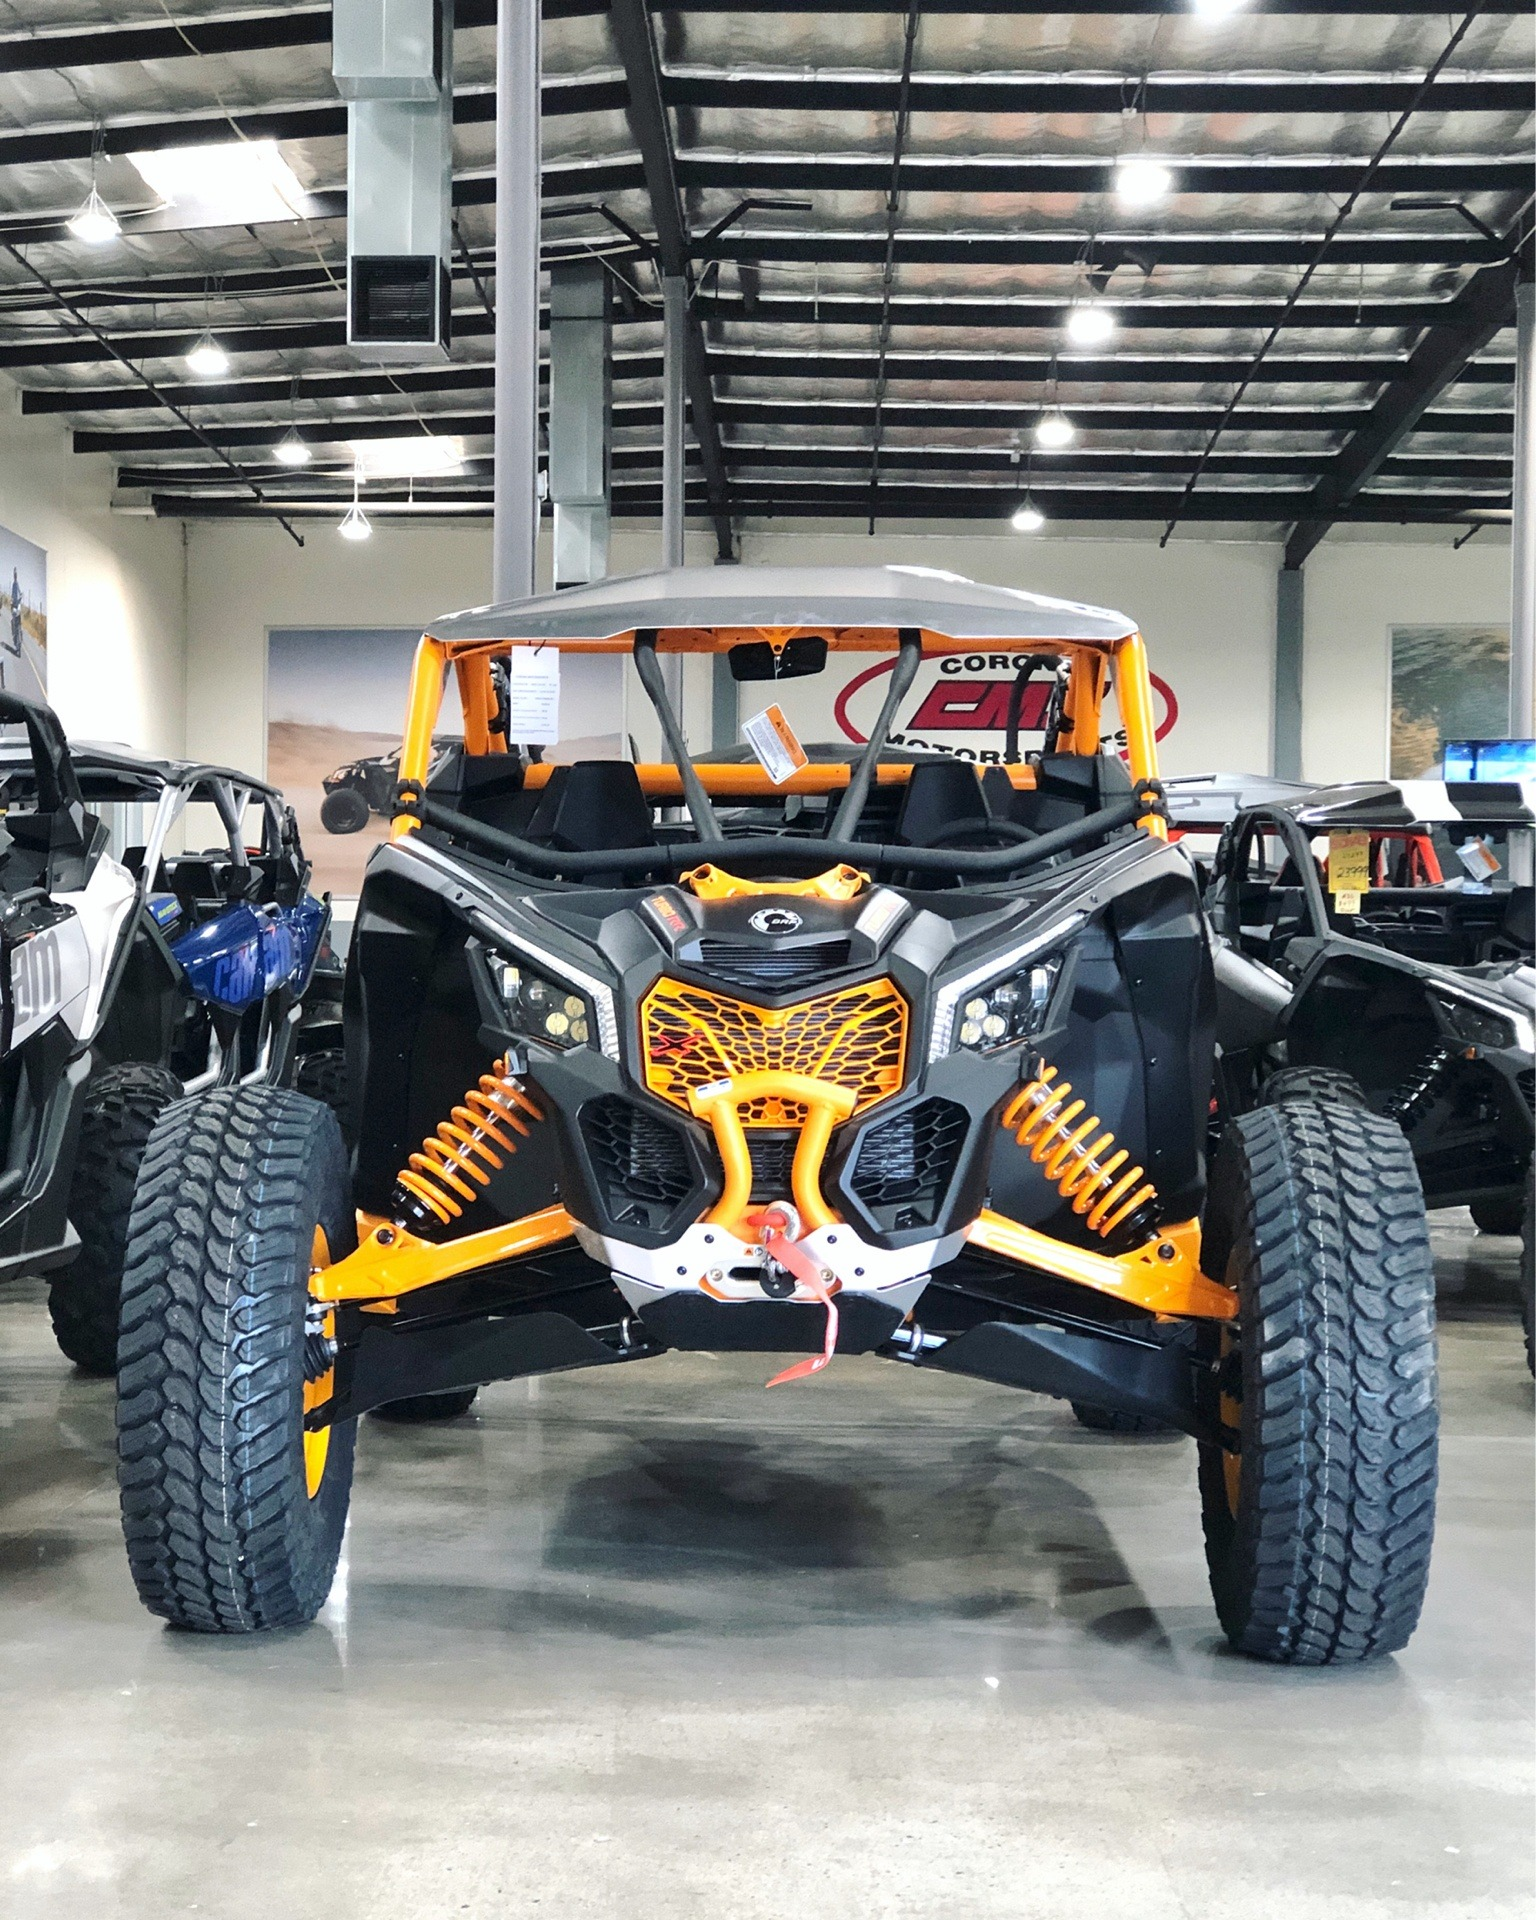 New 2020 Can-Am Maverick X3 X RC Turbo RR Carbon Black